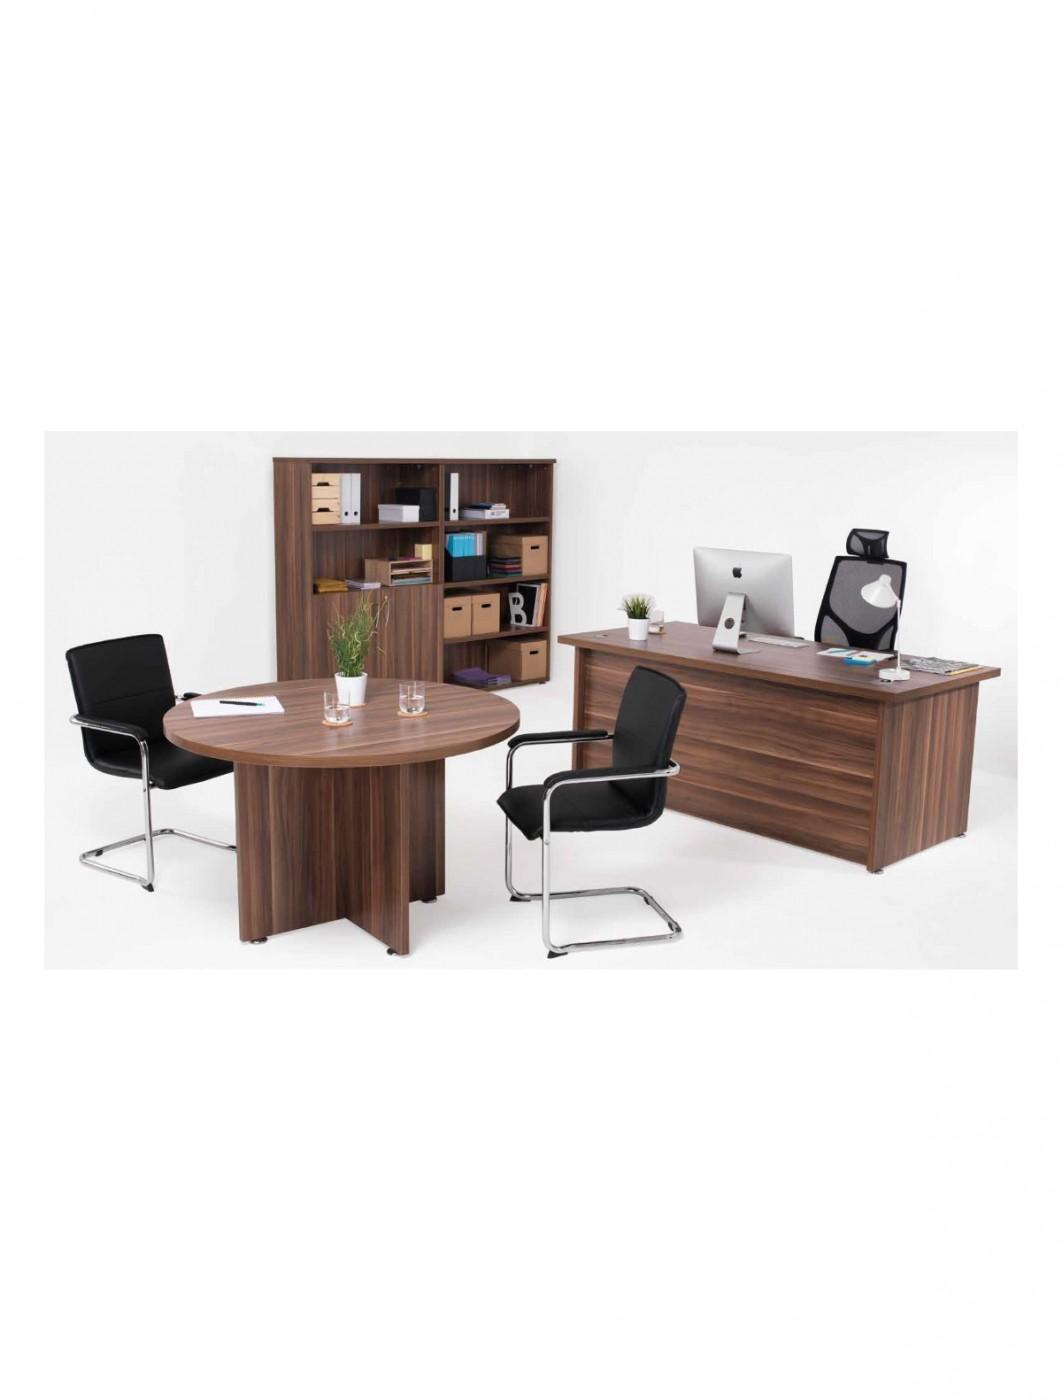 kansas oak hidden home office. Office Desk Walnut. Dark Walnut Desks Tc Regent Executive Boardroom Table 2400mm Tr2410btdw - Kansas Oak Hidden Home